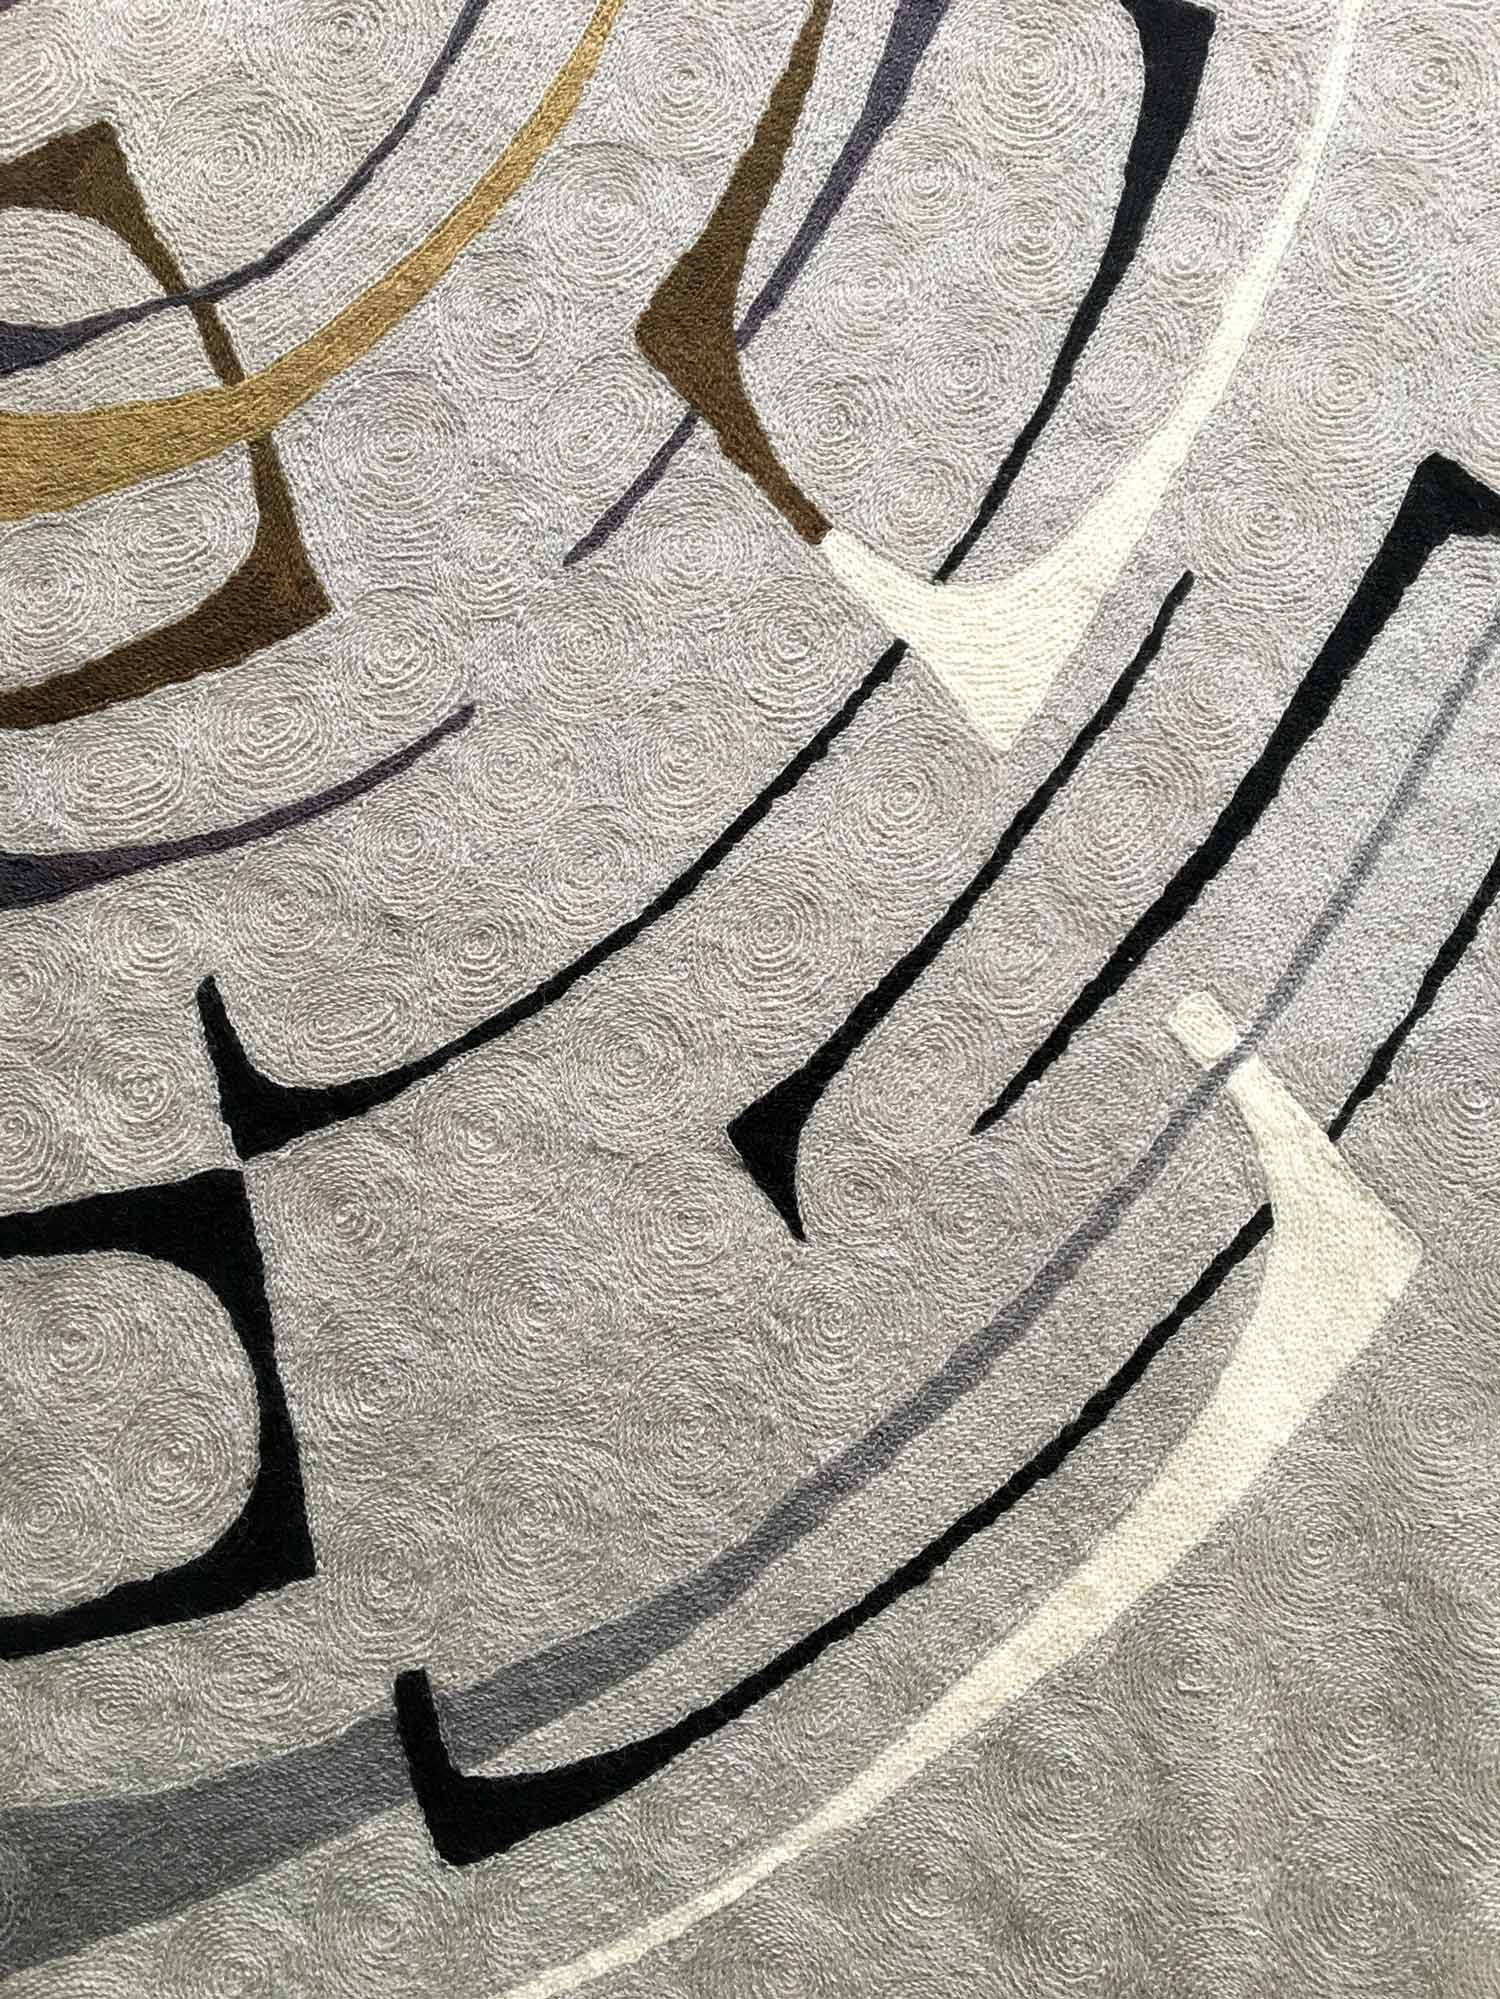 chain-stitch embroidery